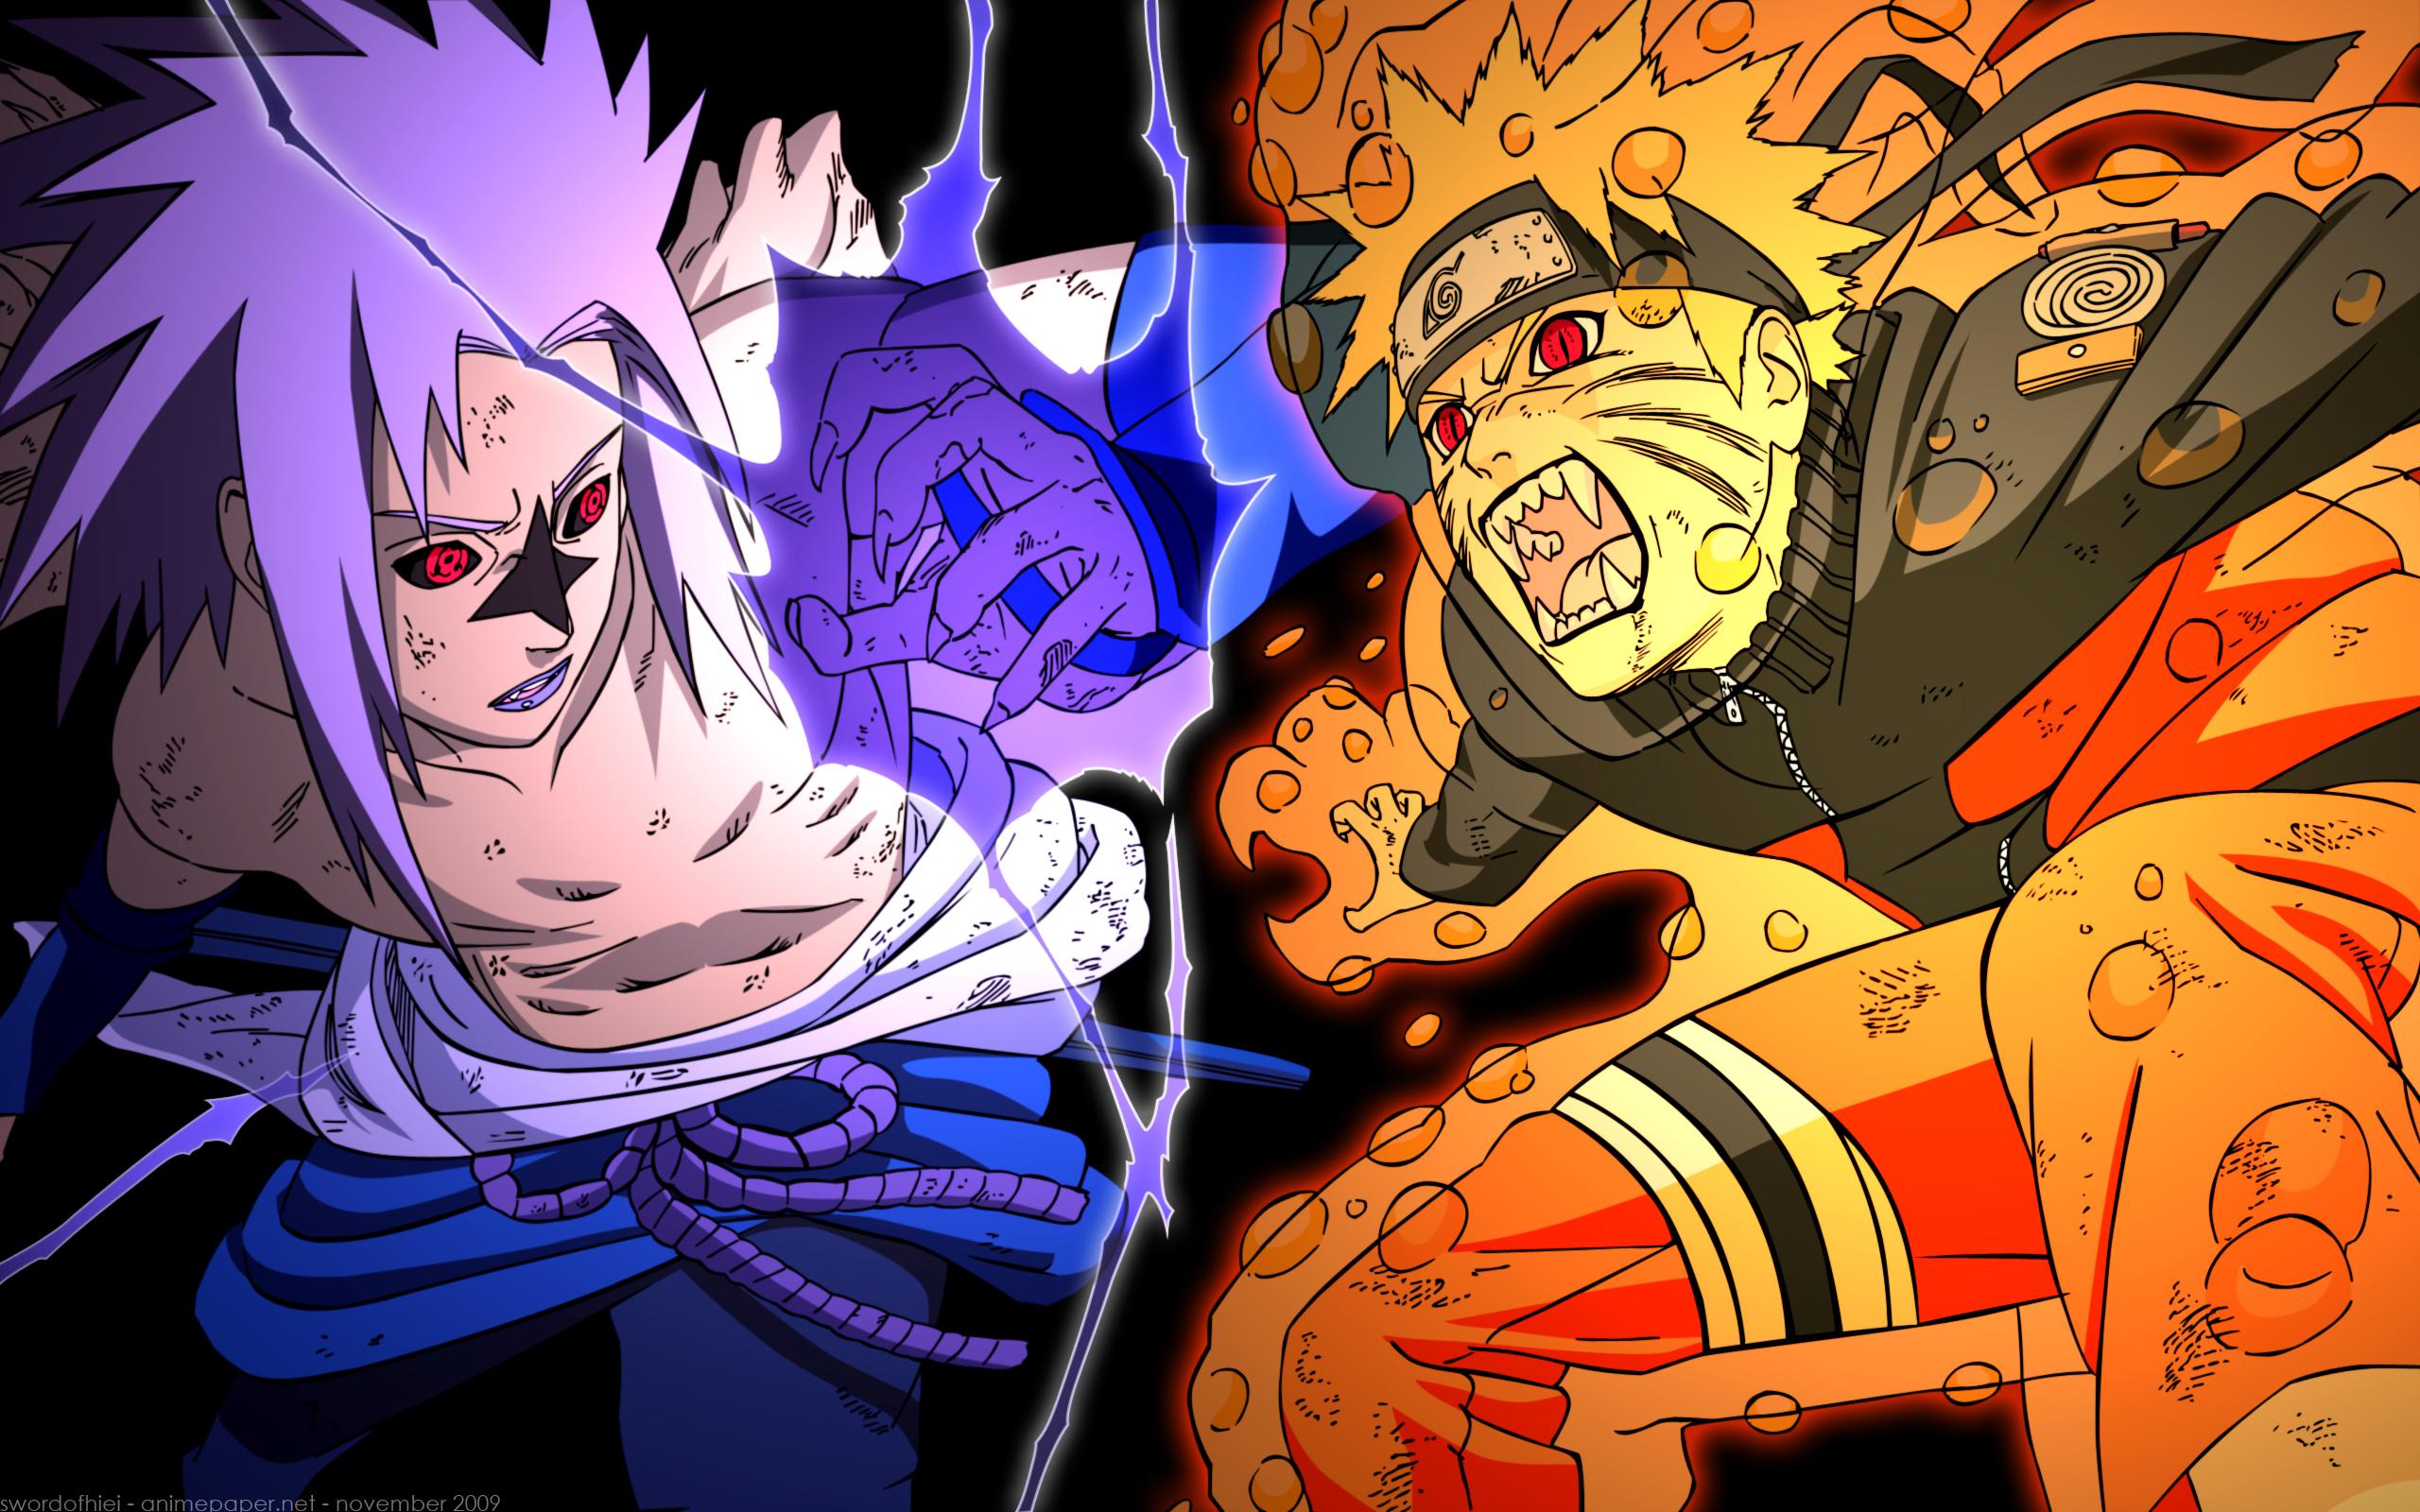 Naruto Nine Tails Wallpaper - WallpaperSafari